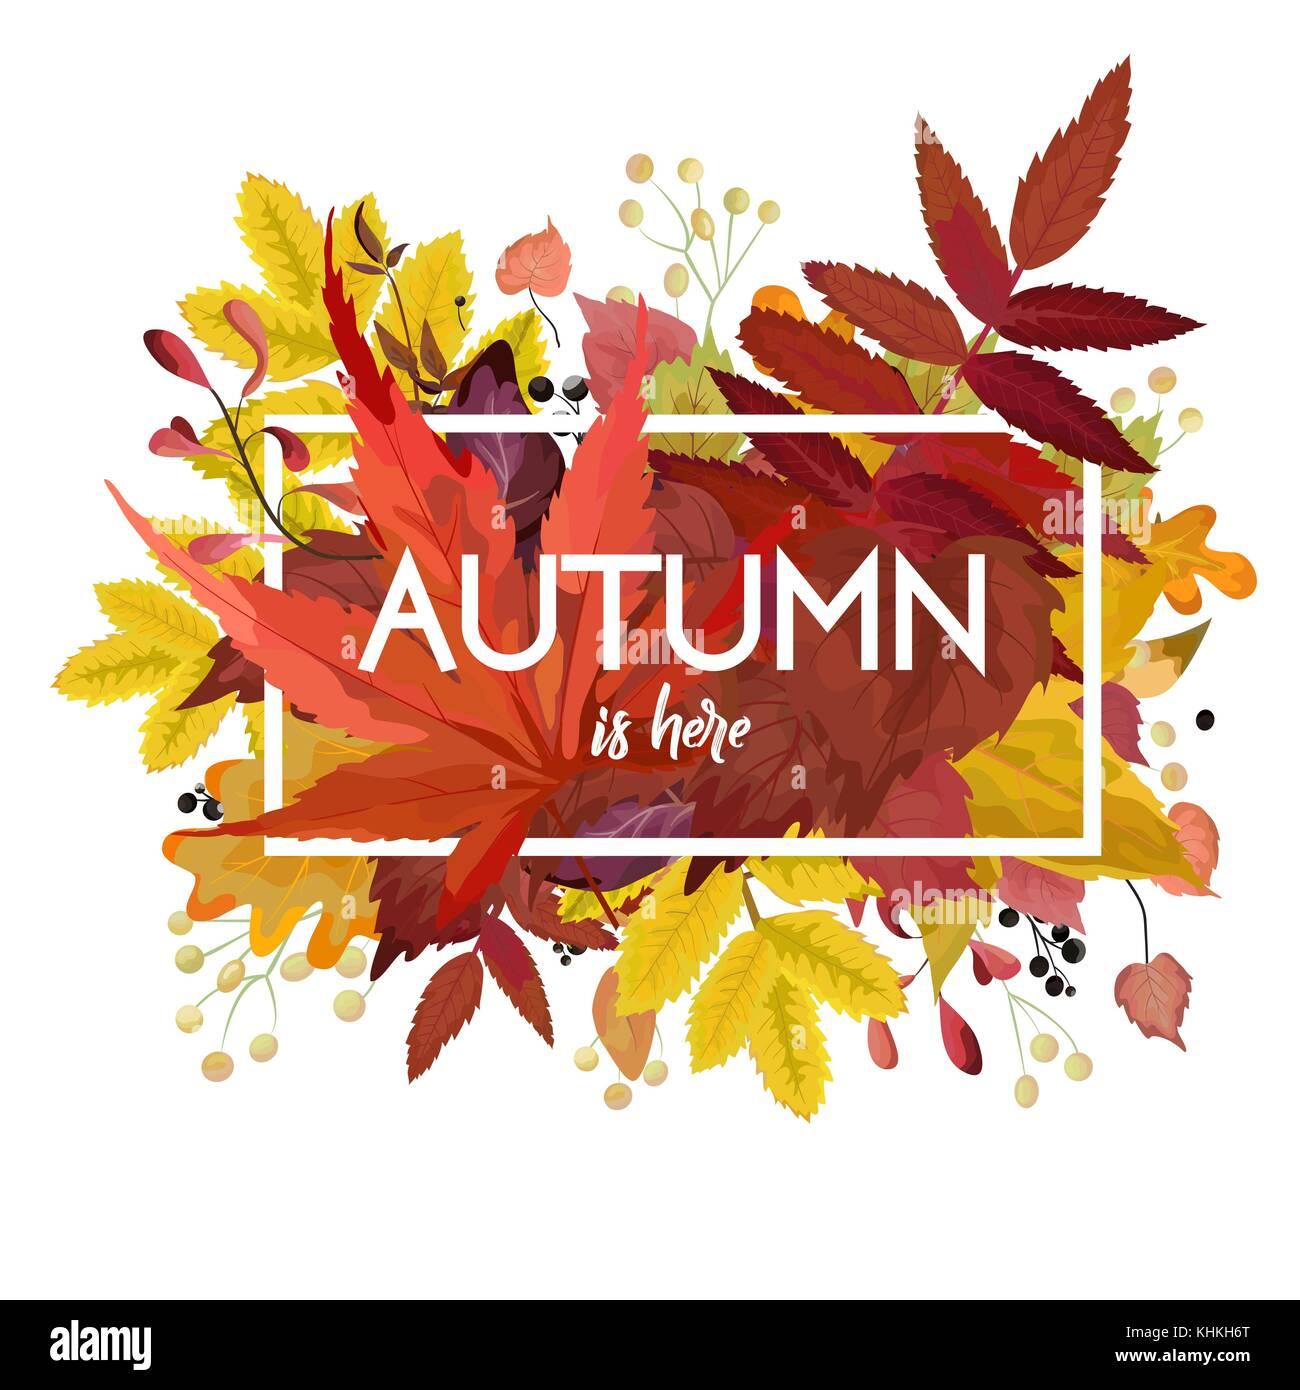 Herbst Vektor Blumen Aquarell Stil Card Design Grenze Rahmen Bunte